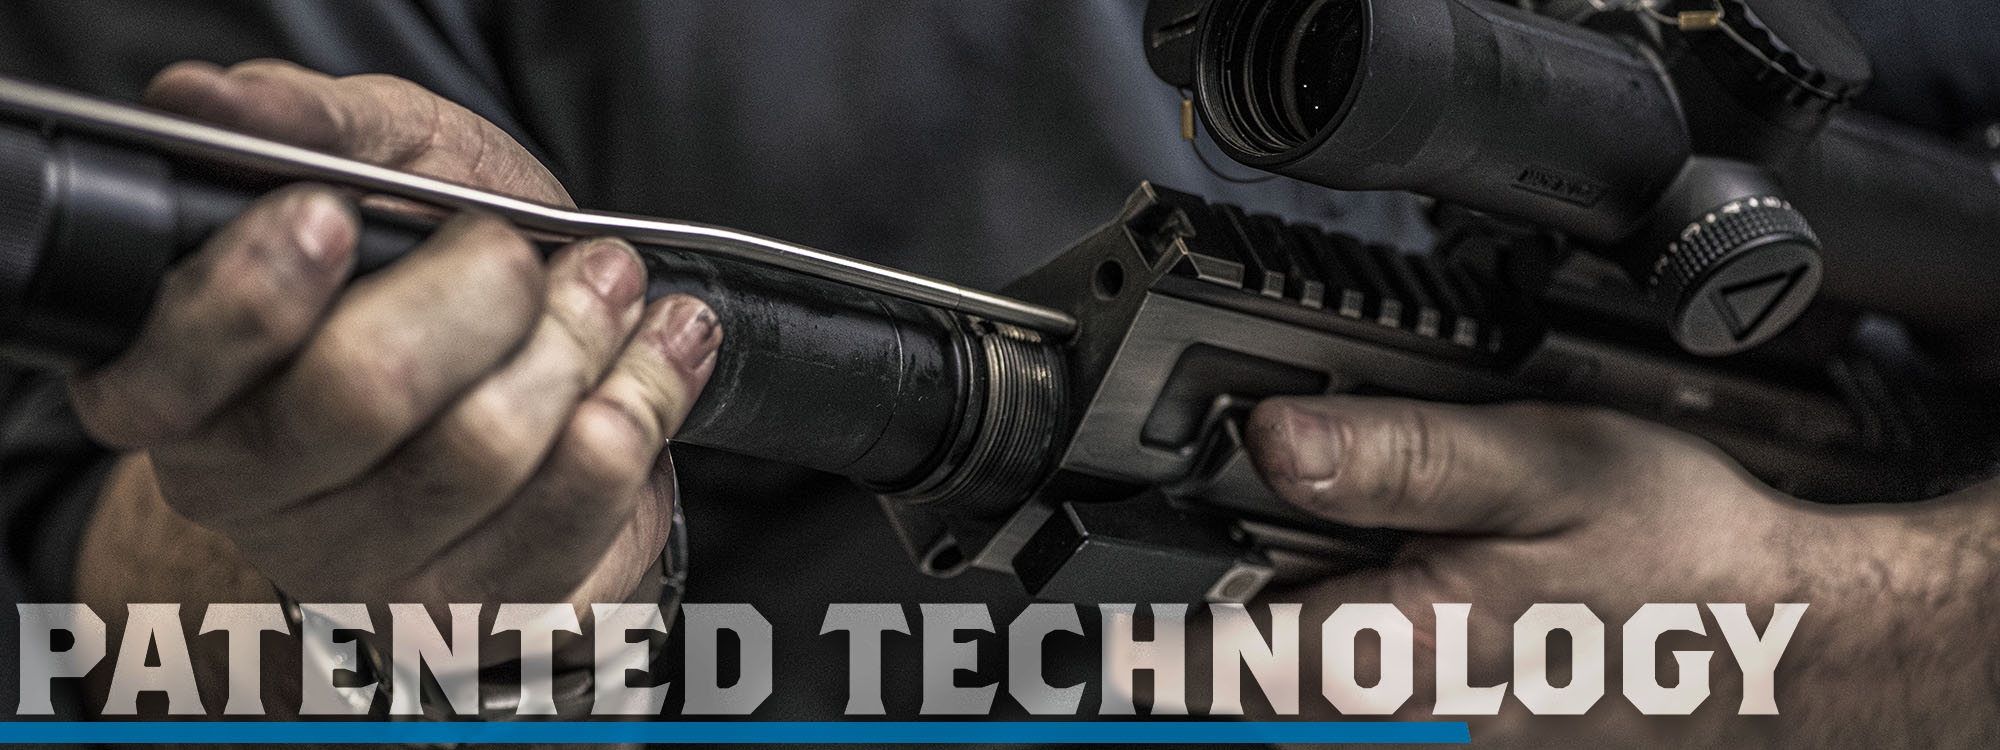 0-0004-patented-technology.jpg